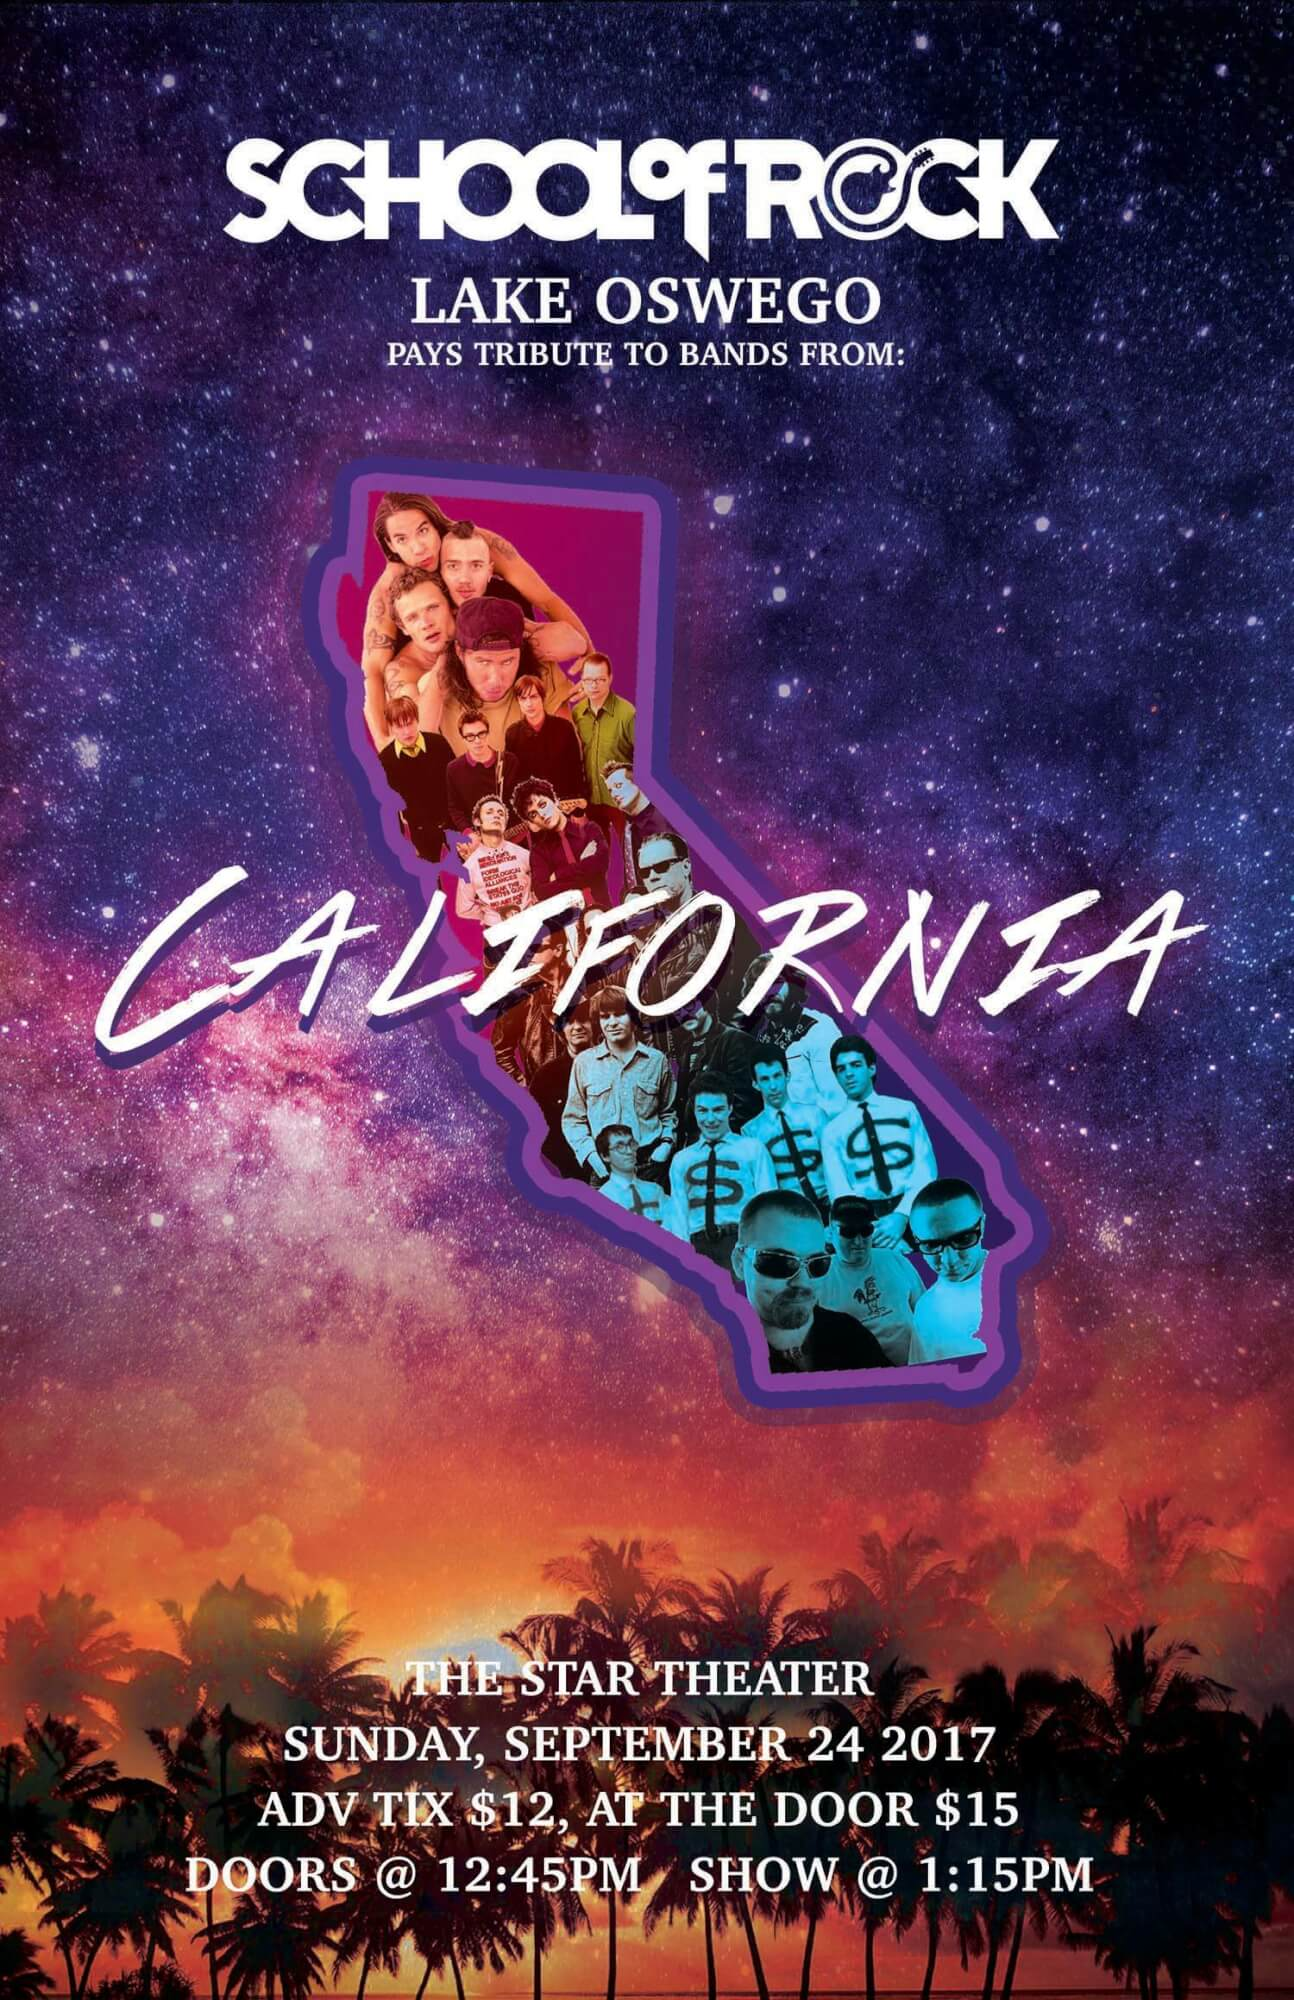 California- Rockin' bands from Cali.